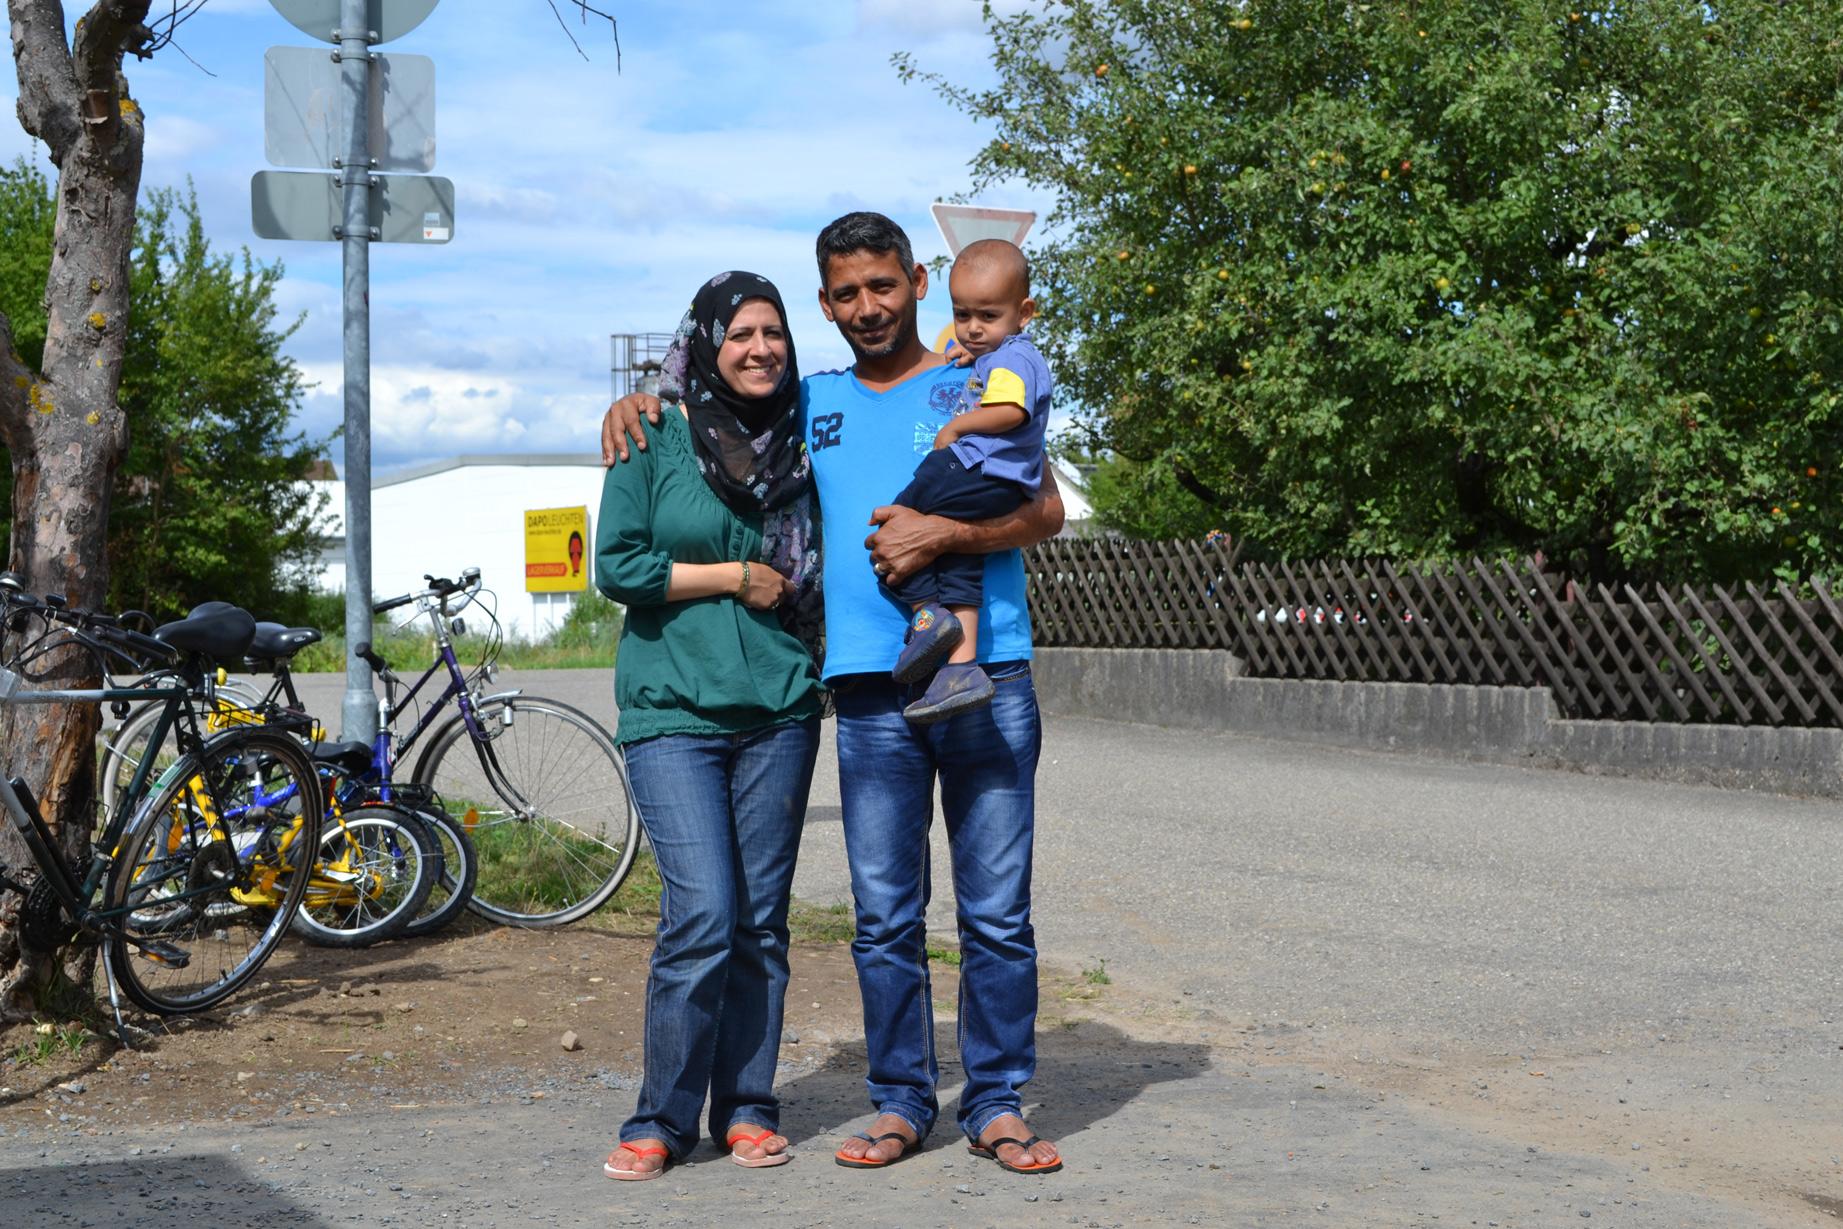 fluechtlinge-asylbewerber-reportage-bad-schoenborn-kronau-ali_small